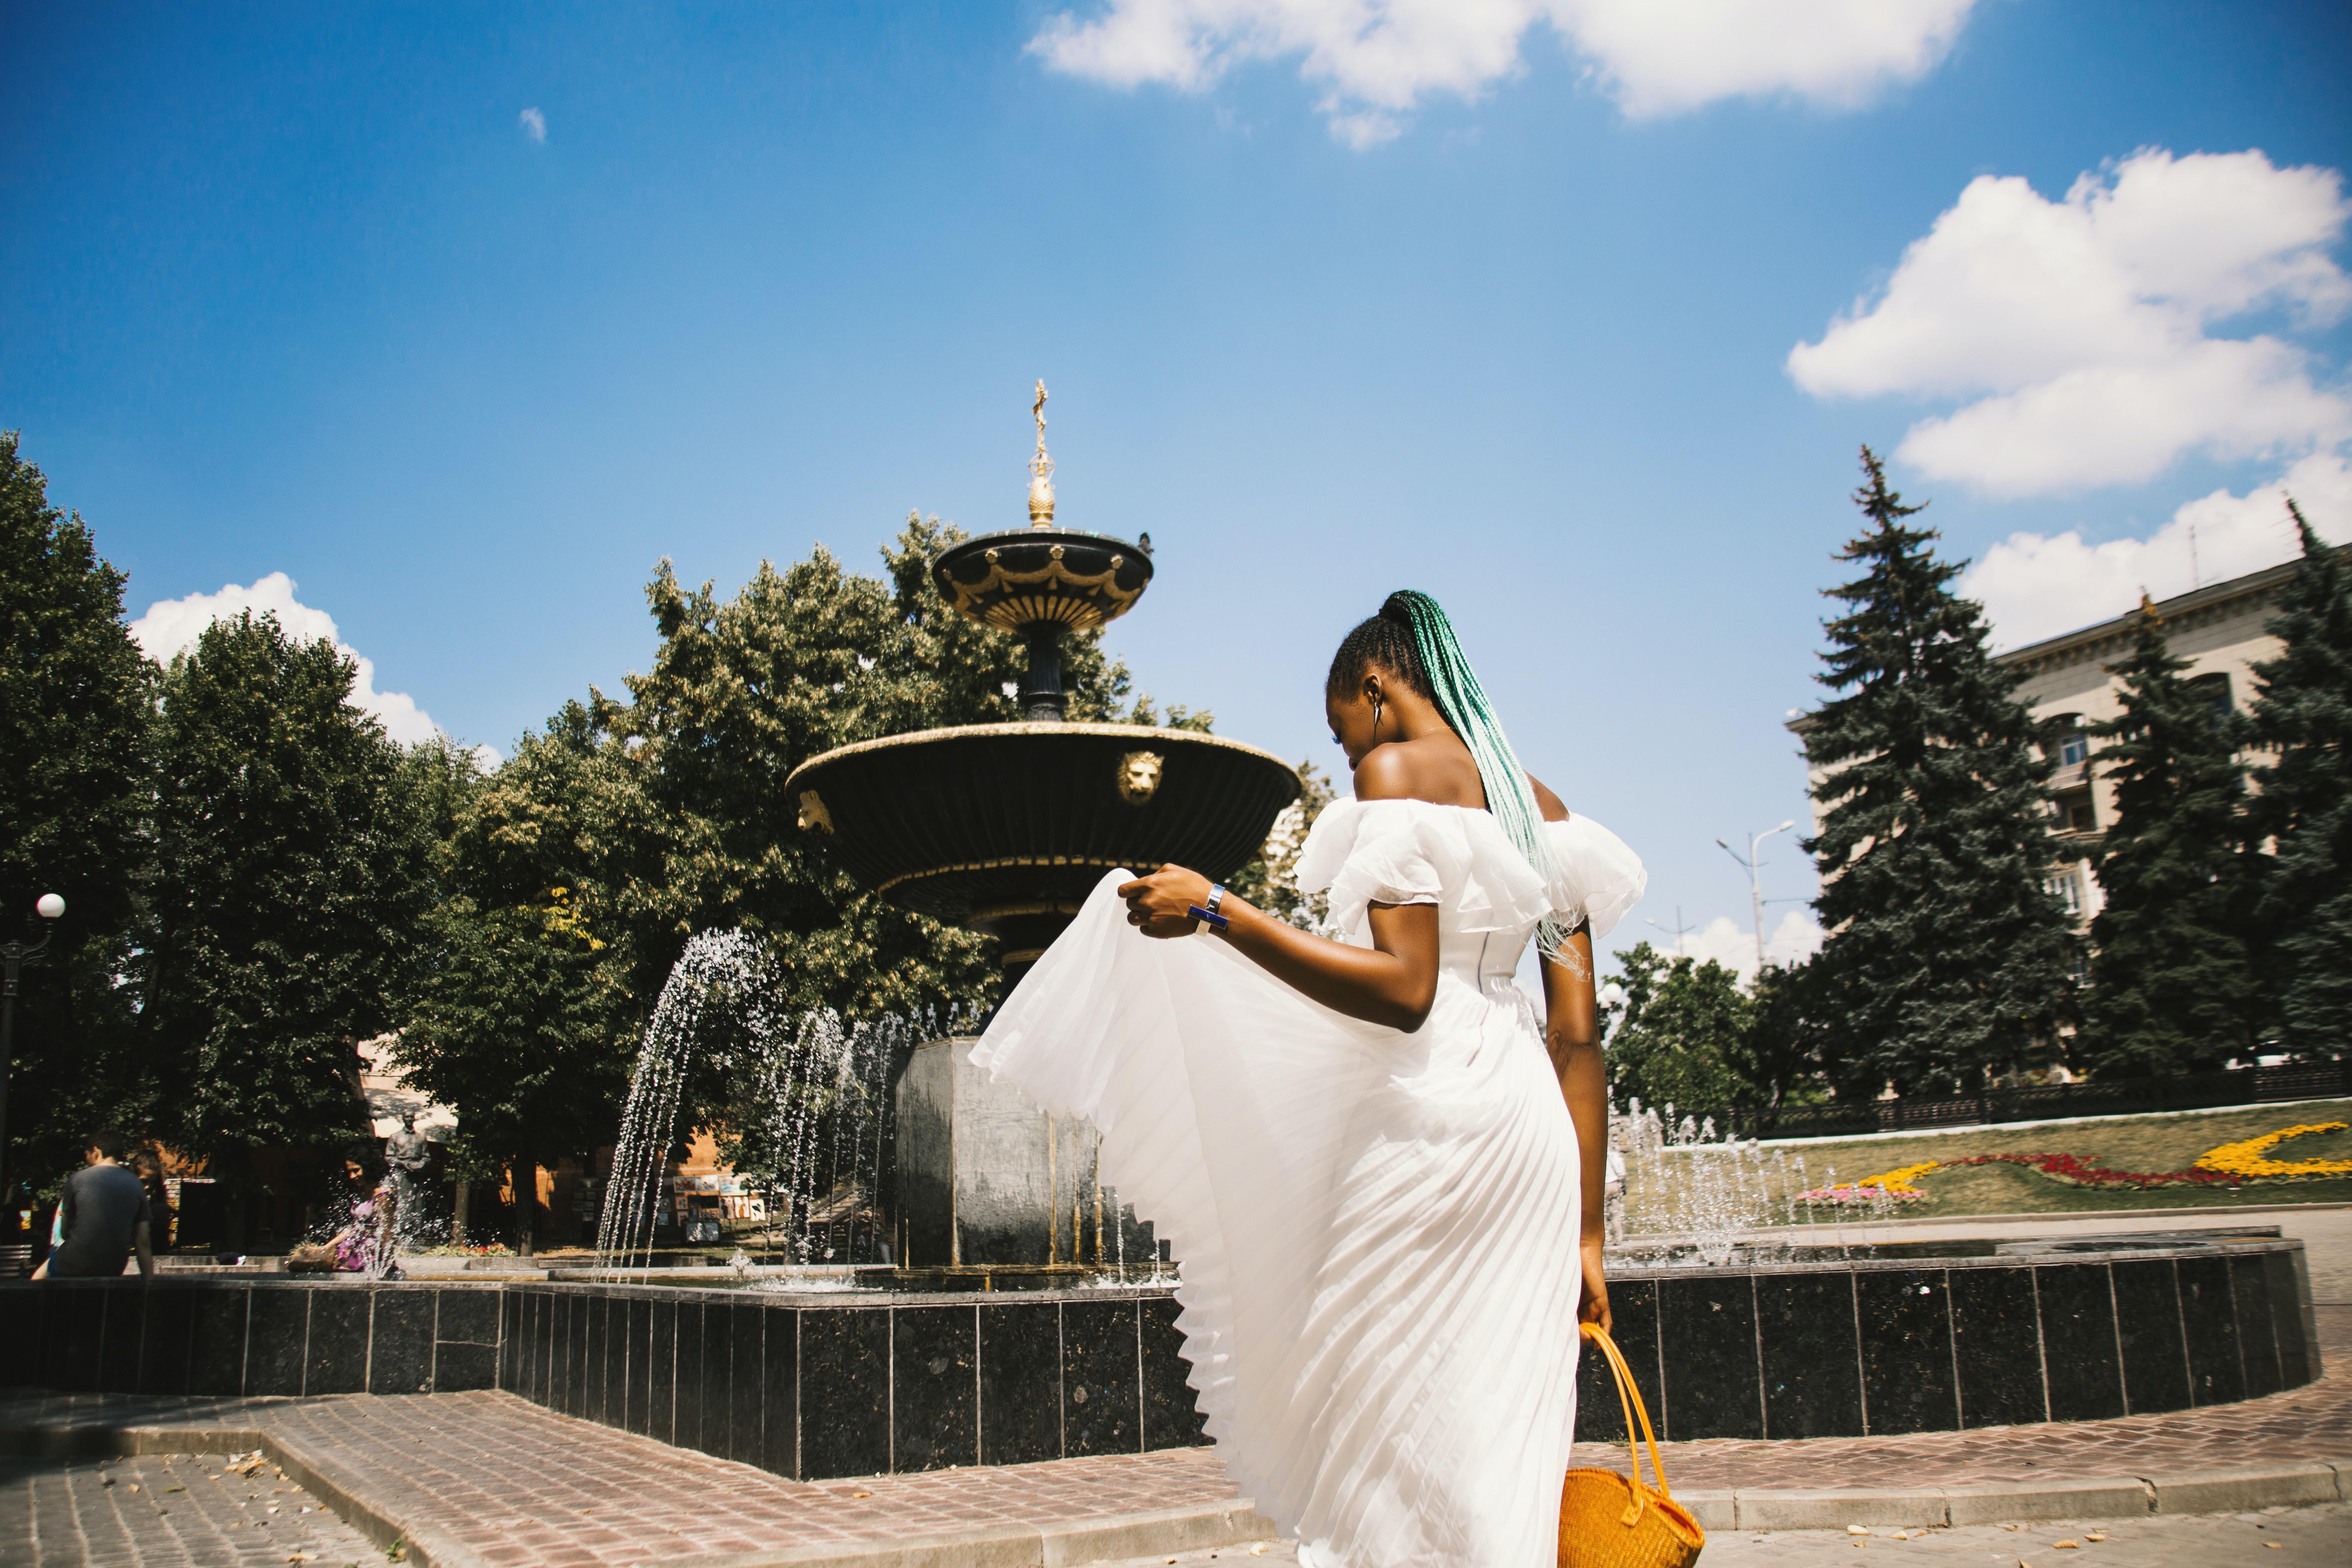 woman standing near water fountain